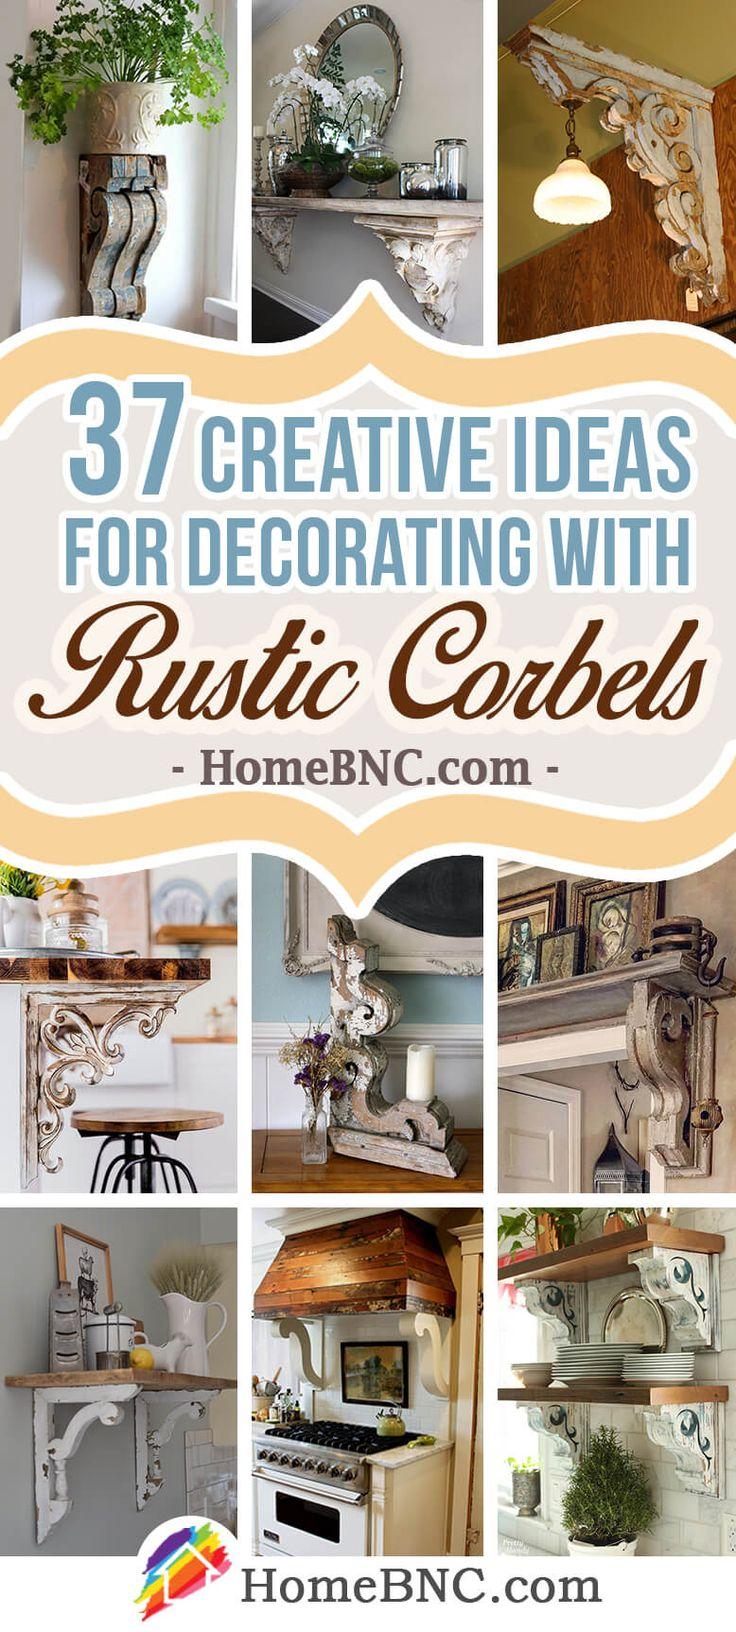 Corbel Decorations